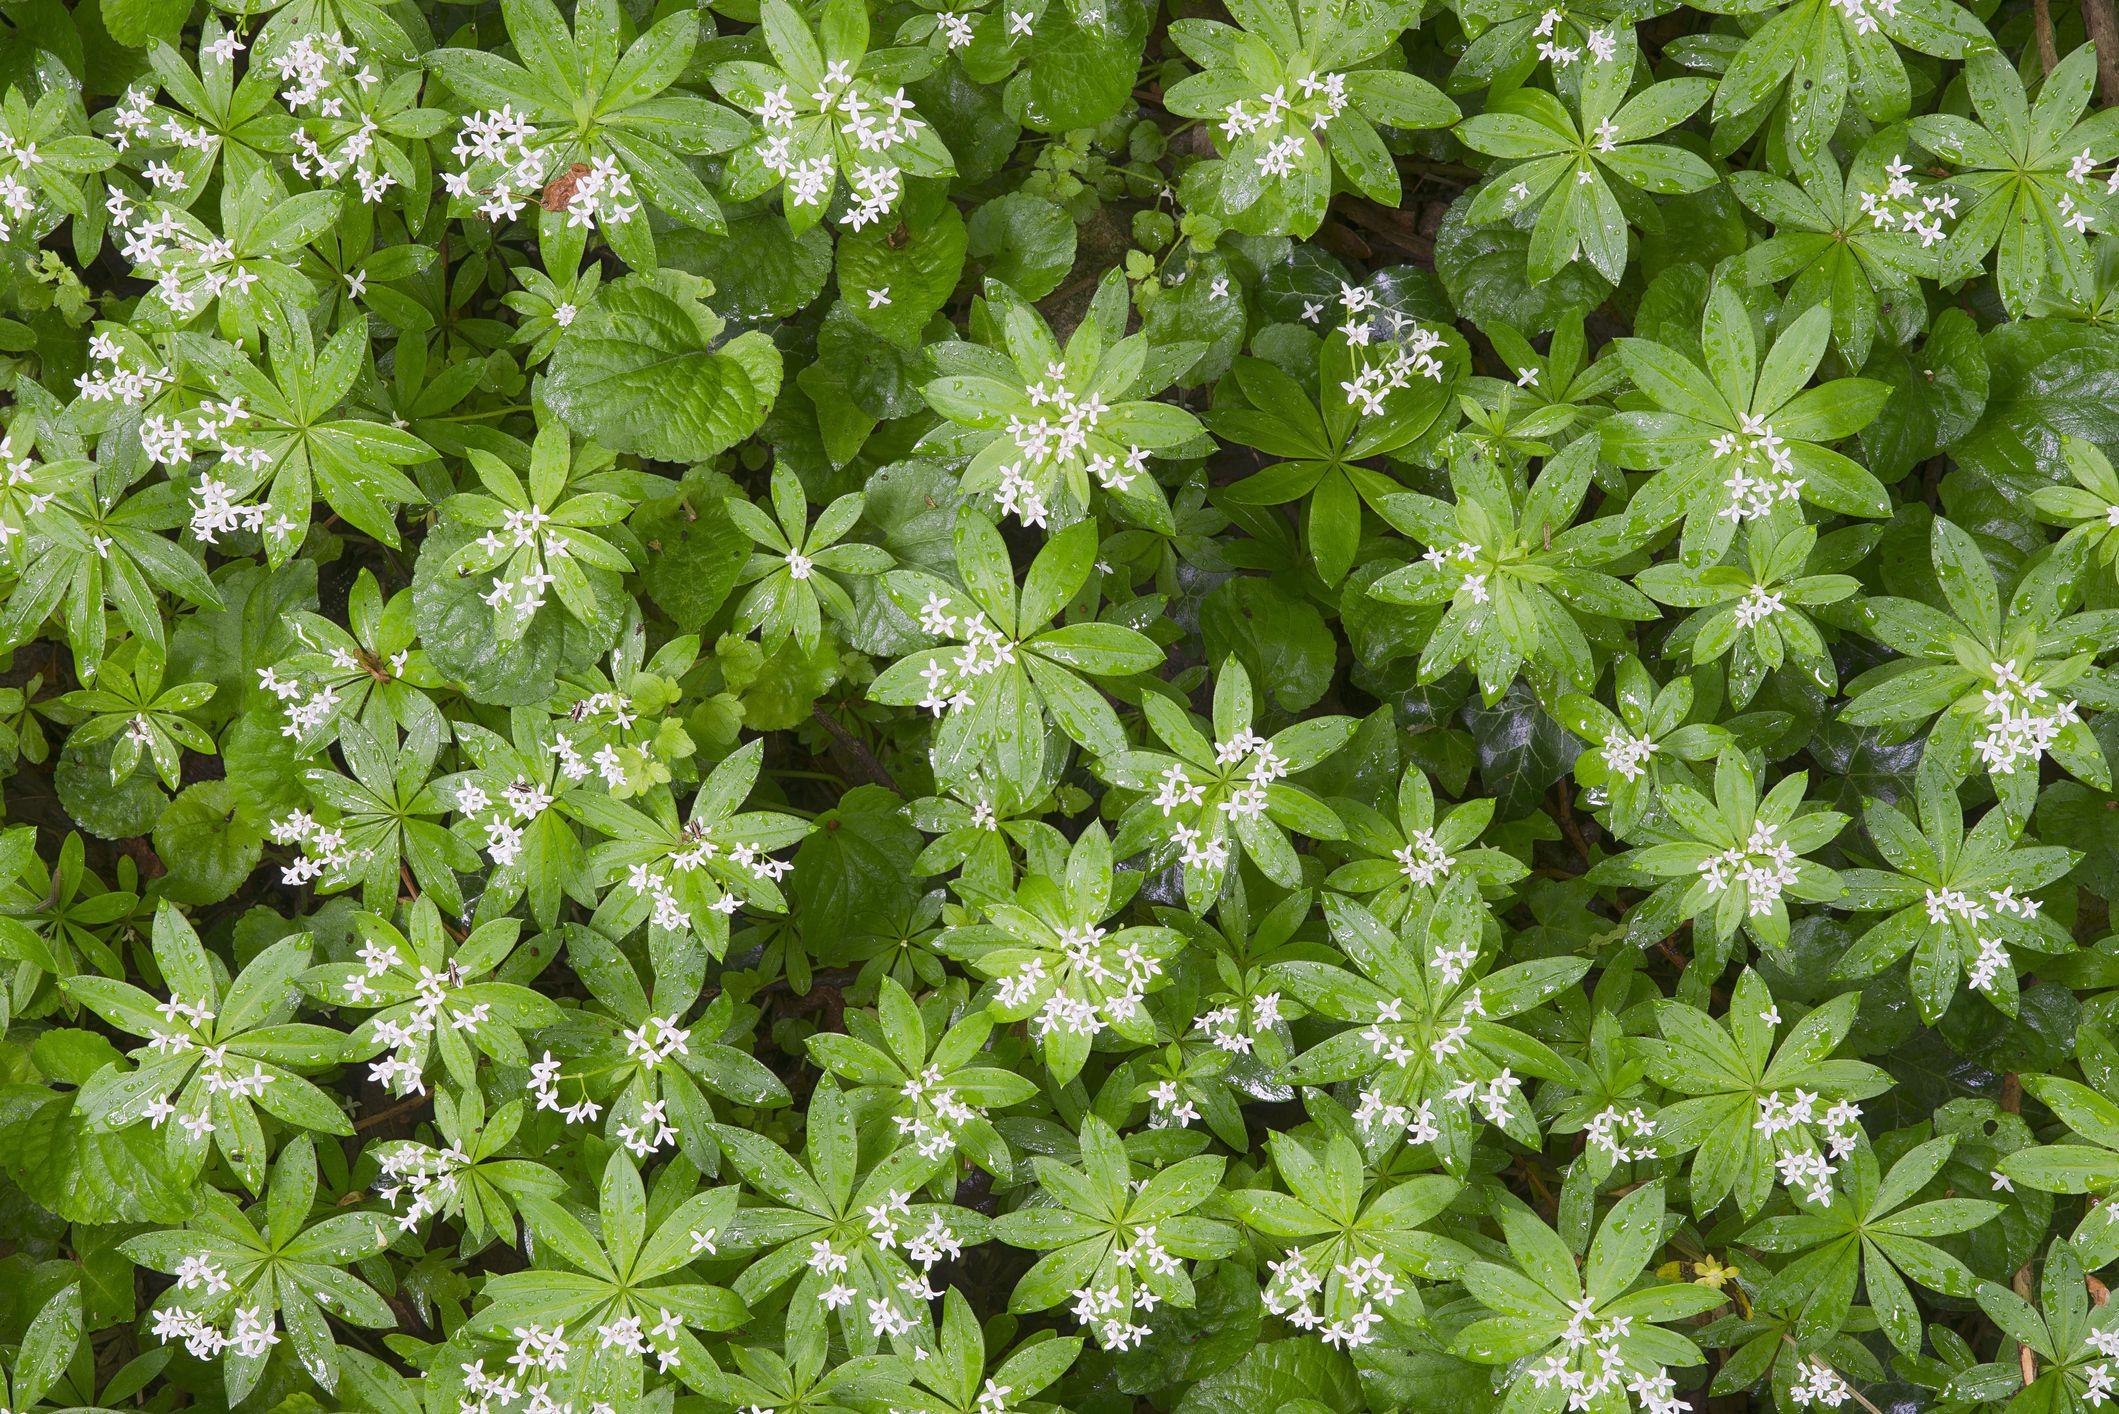 Sweet Woodruff or Wild Baby's Breath (Galium odoratum), Perchtoldsdorfer Heide, Perchtoldsdorf, Lower Austria, Austria